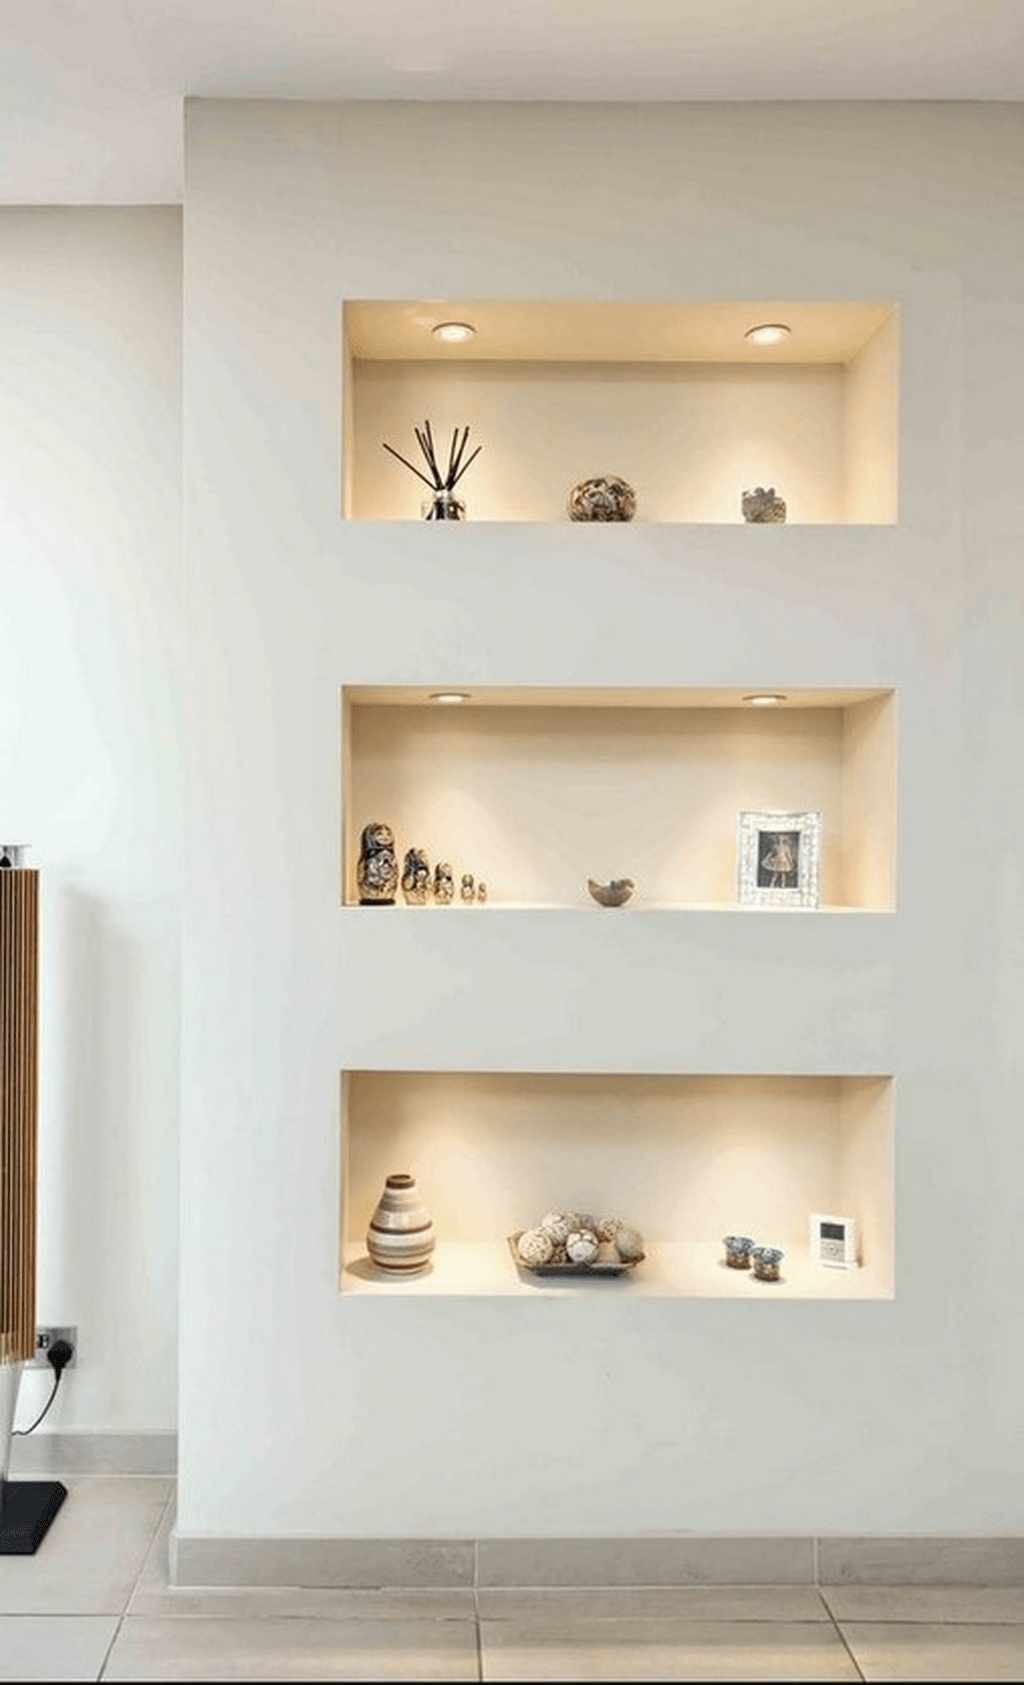 33 Inspiring Drywall Design Ideas To Beautify Your Interior Interior Wall Design Niche Design Niche Decor